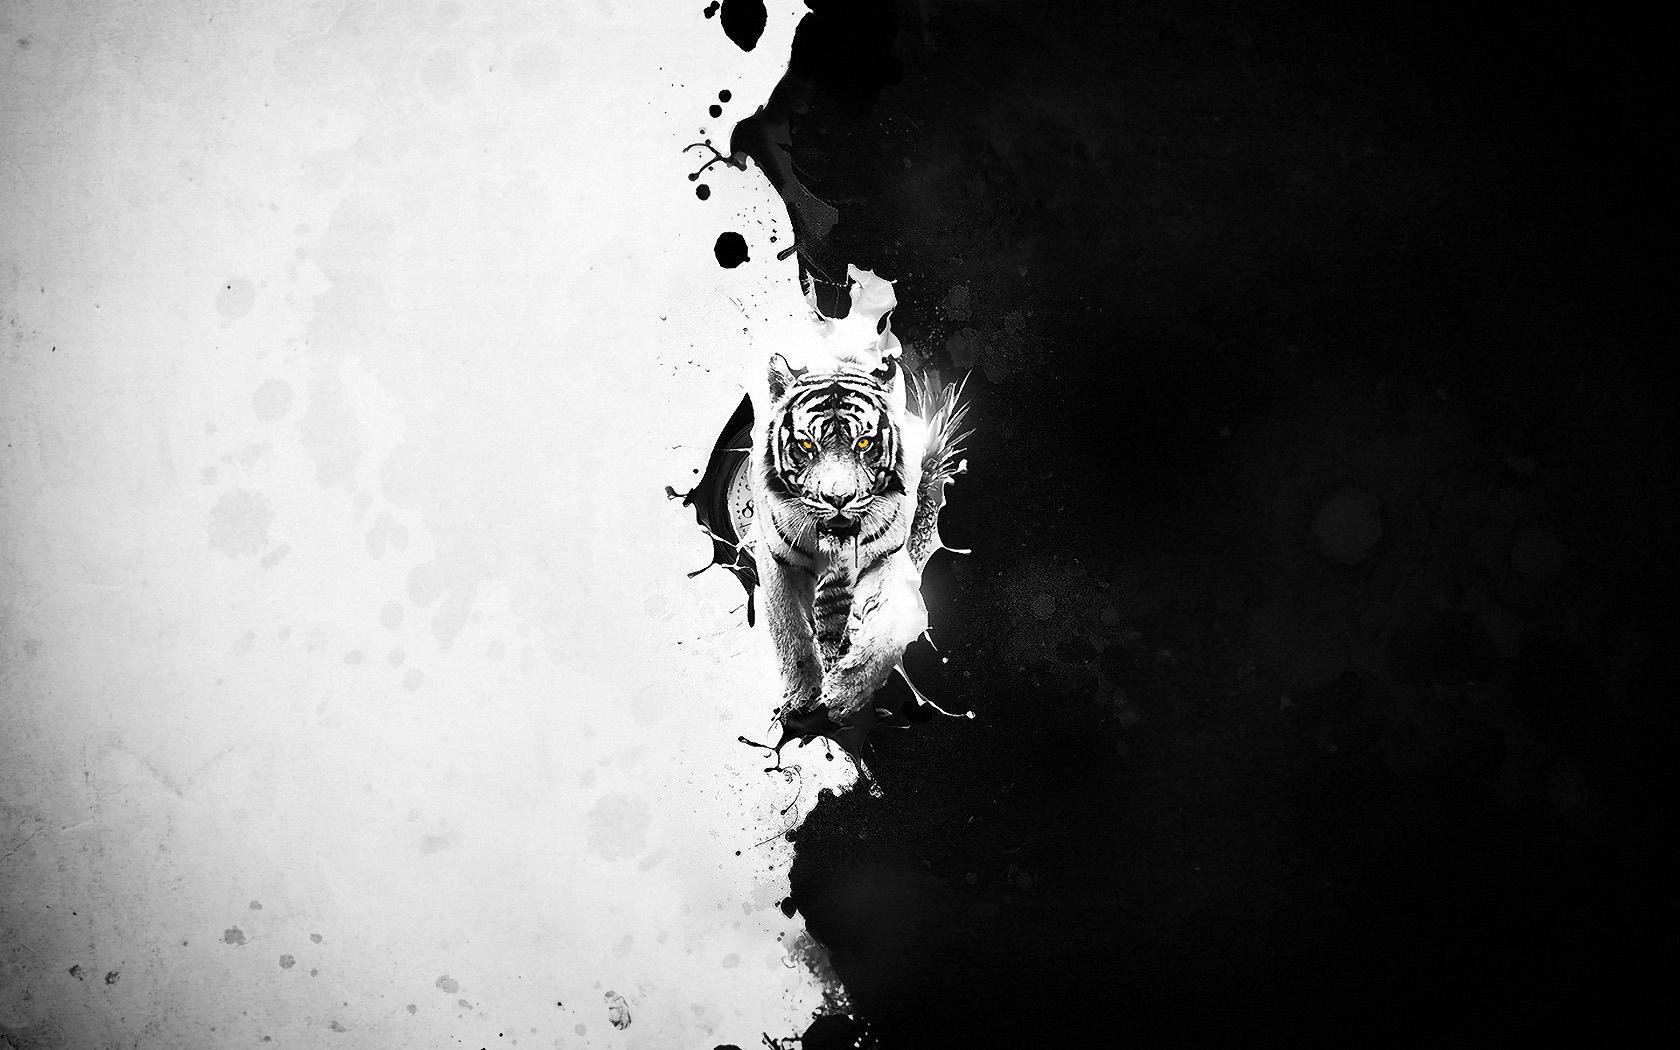 Black And White Tiger Wallpaper 1680x1050 Download Hd Wallpaper Wallpapertip